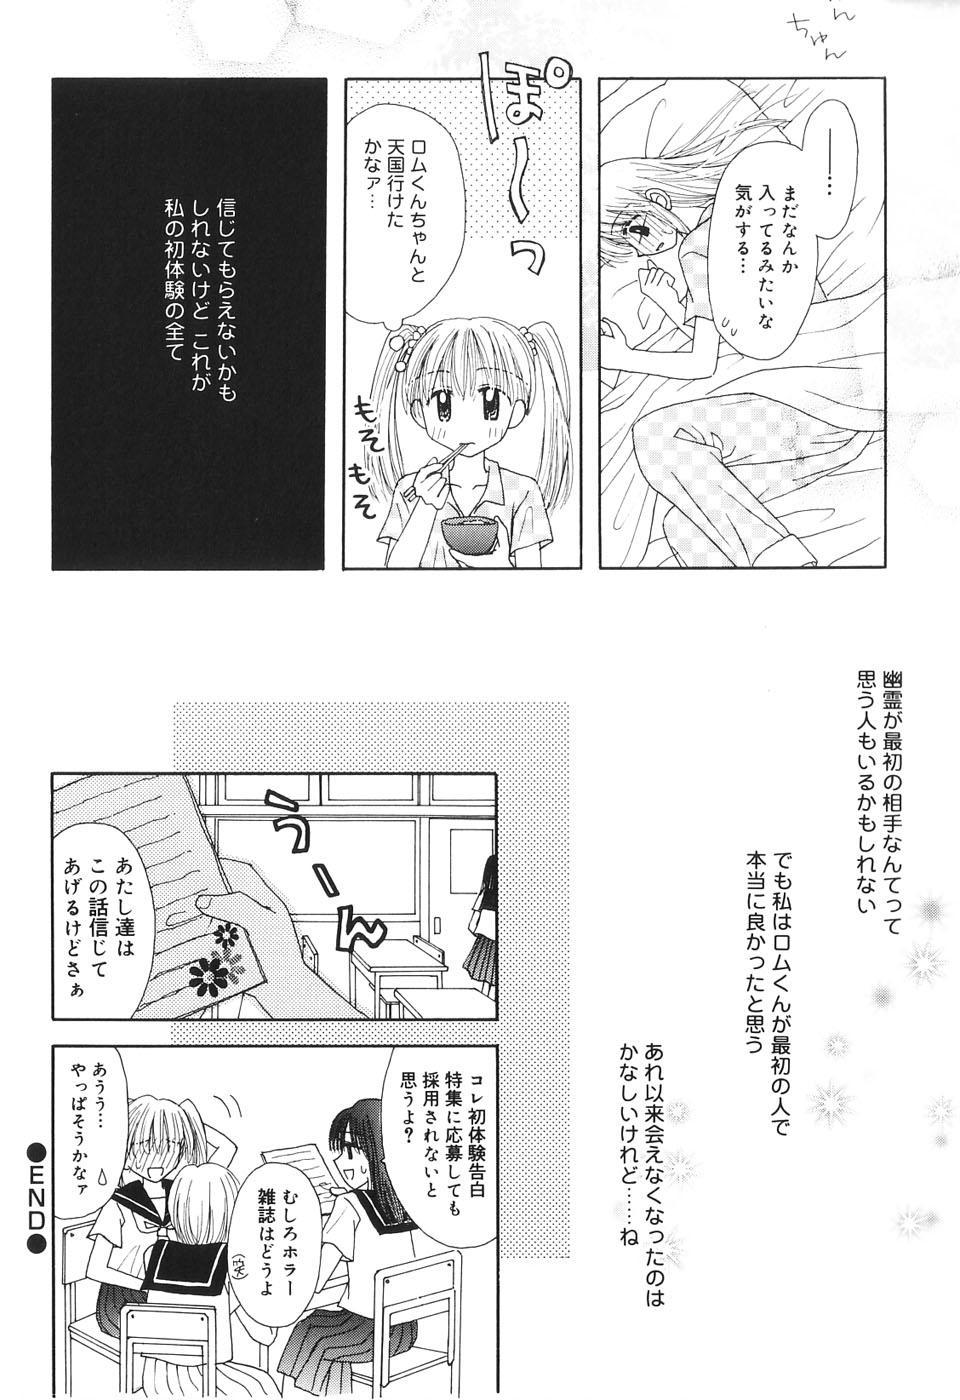 Musoubana 72